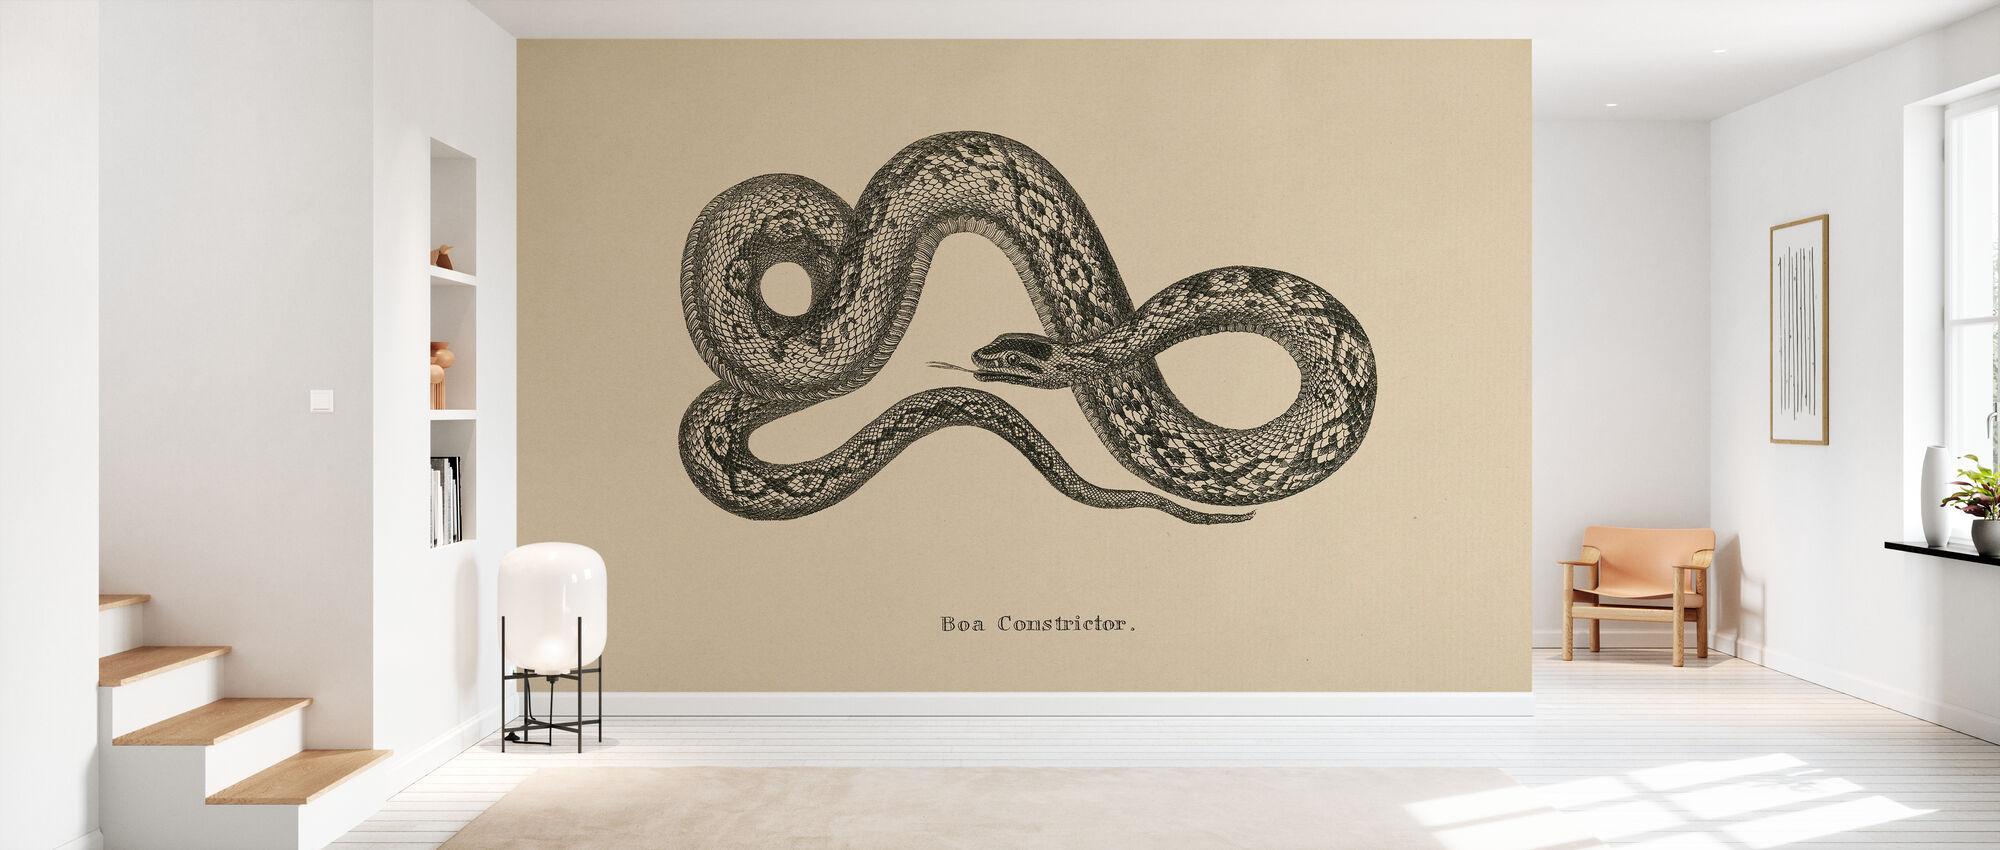 Vintage Boa Constrictor - Tapet - Entré